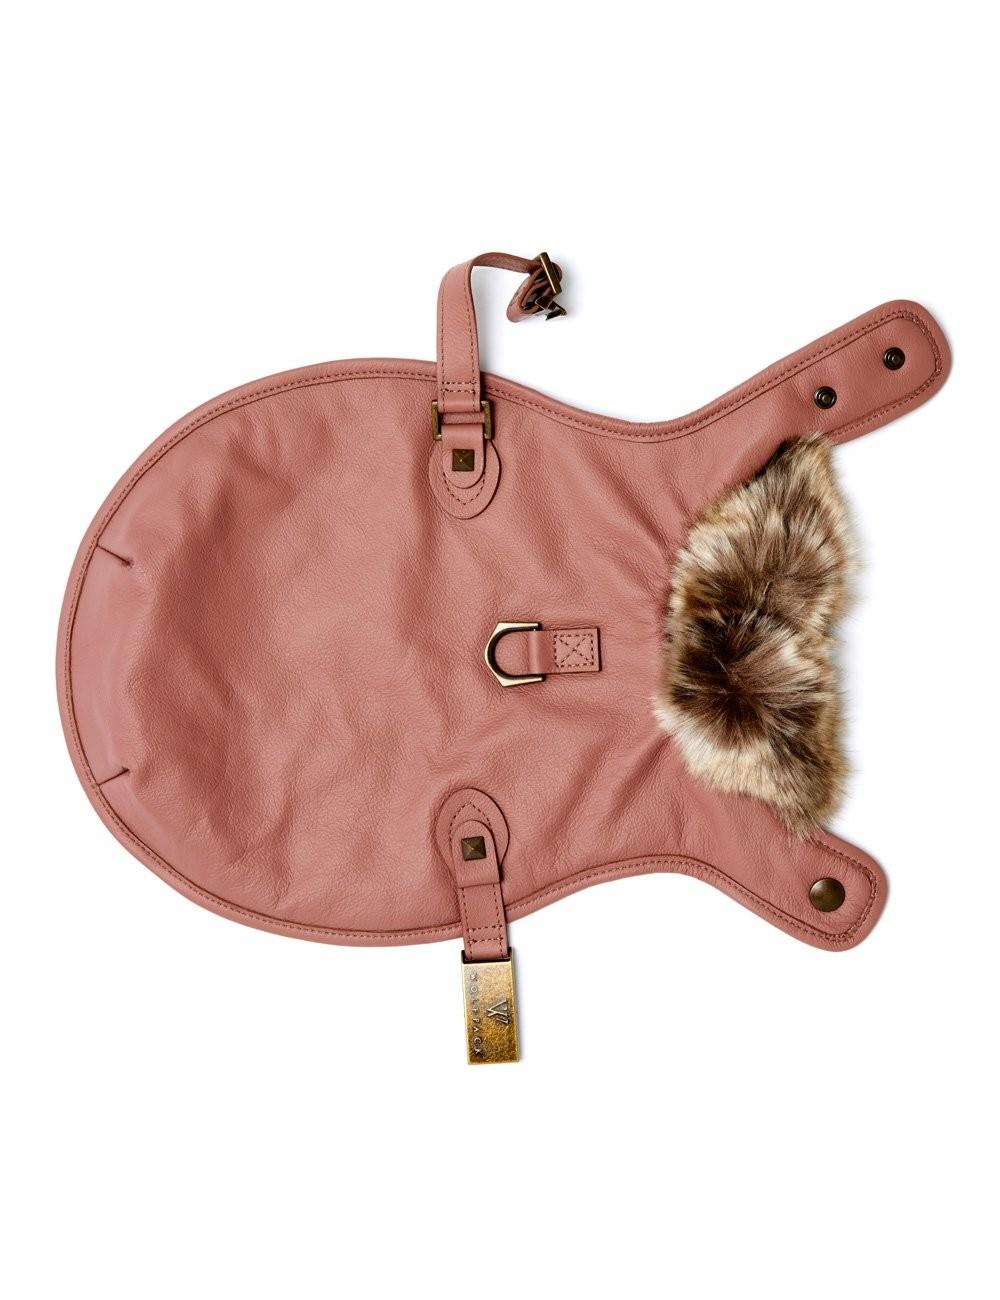 Leather Dog Jacket in Rose